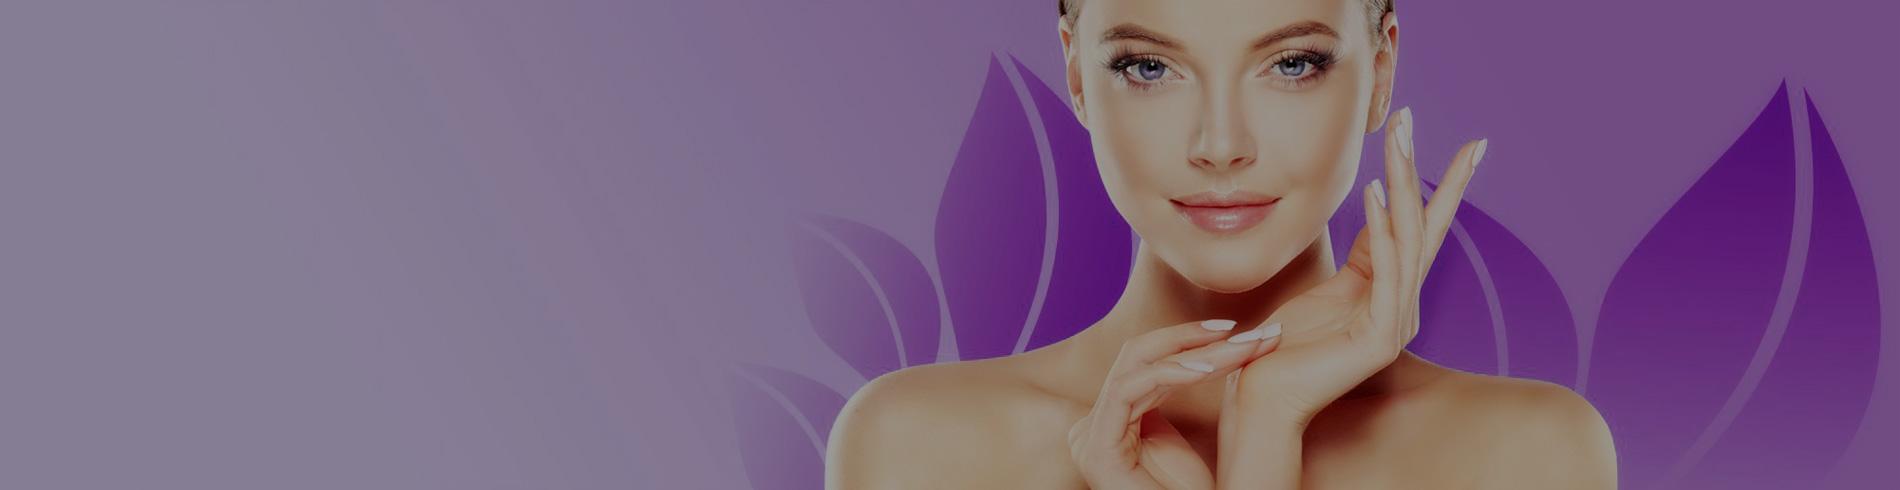 kontakt_kosmetik sudio_beautybycris